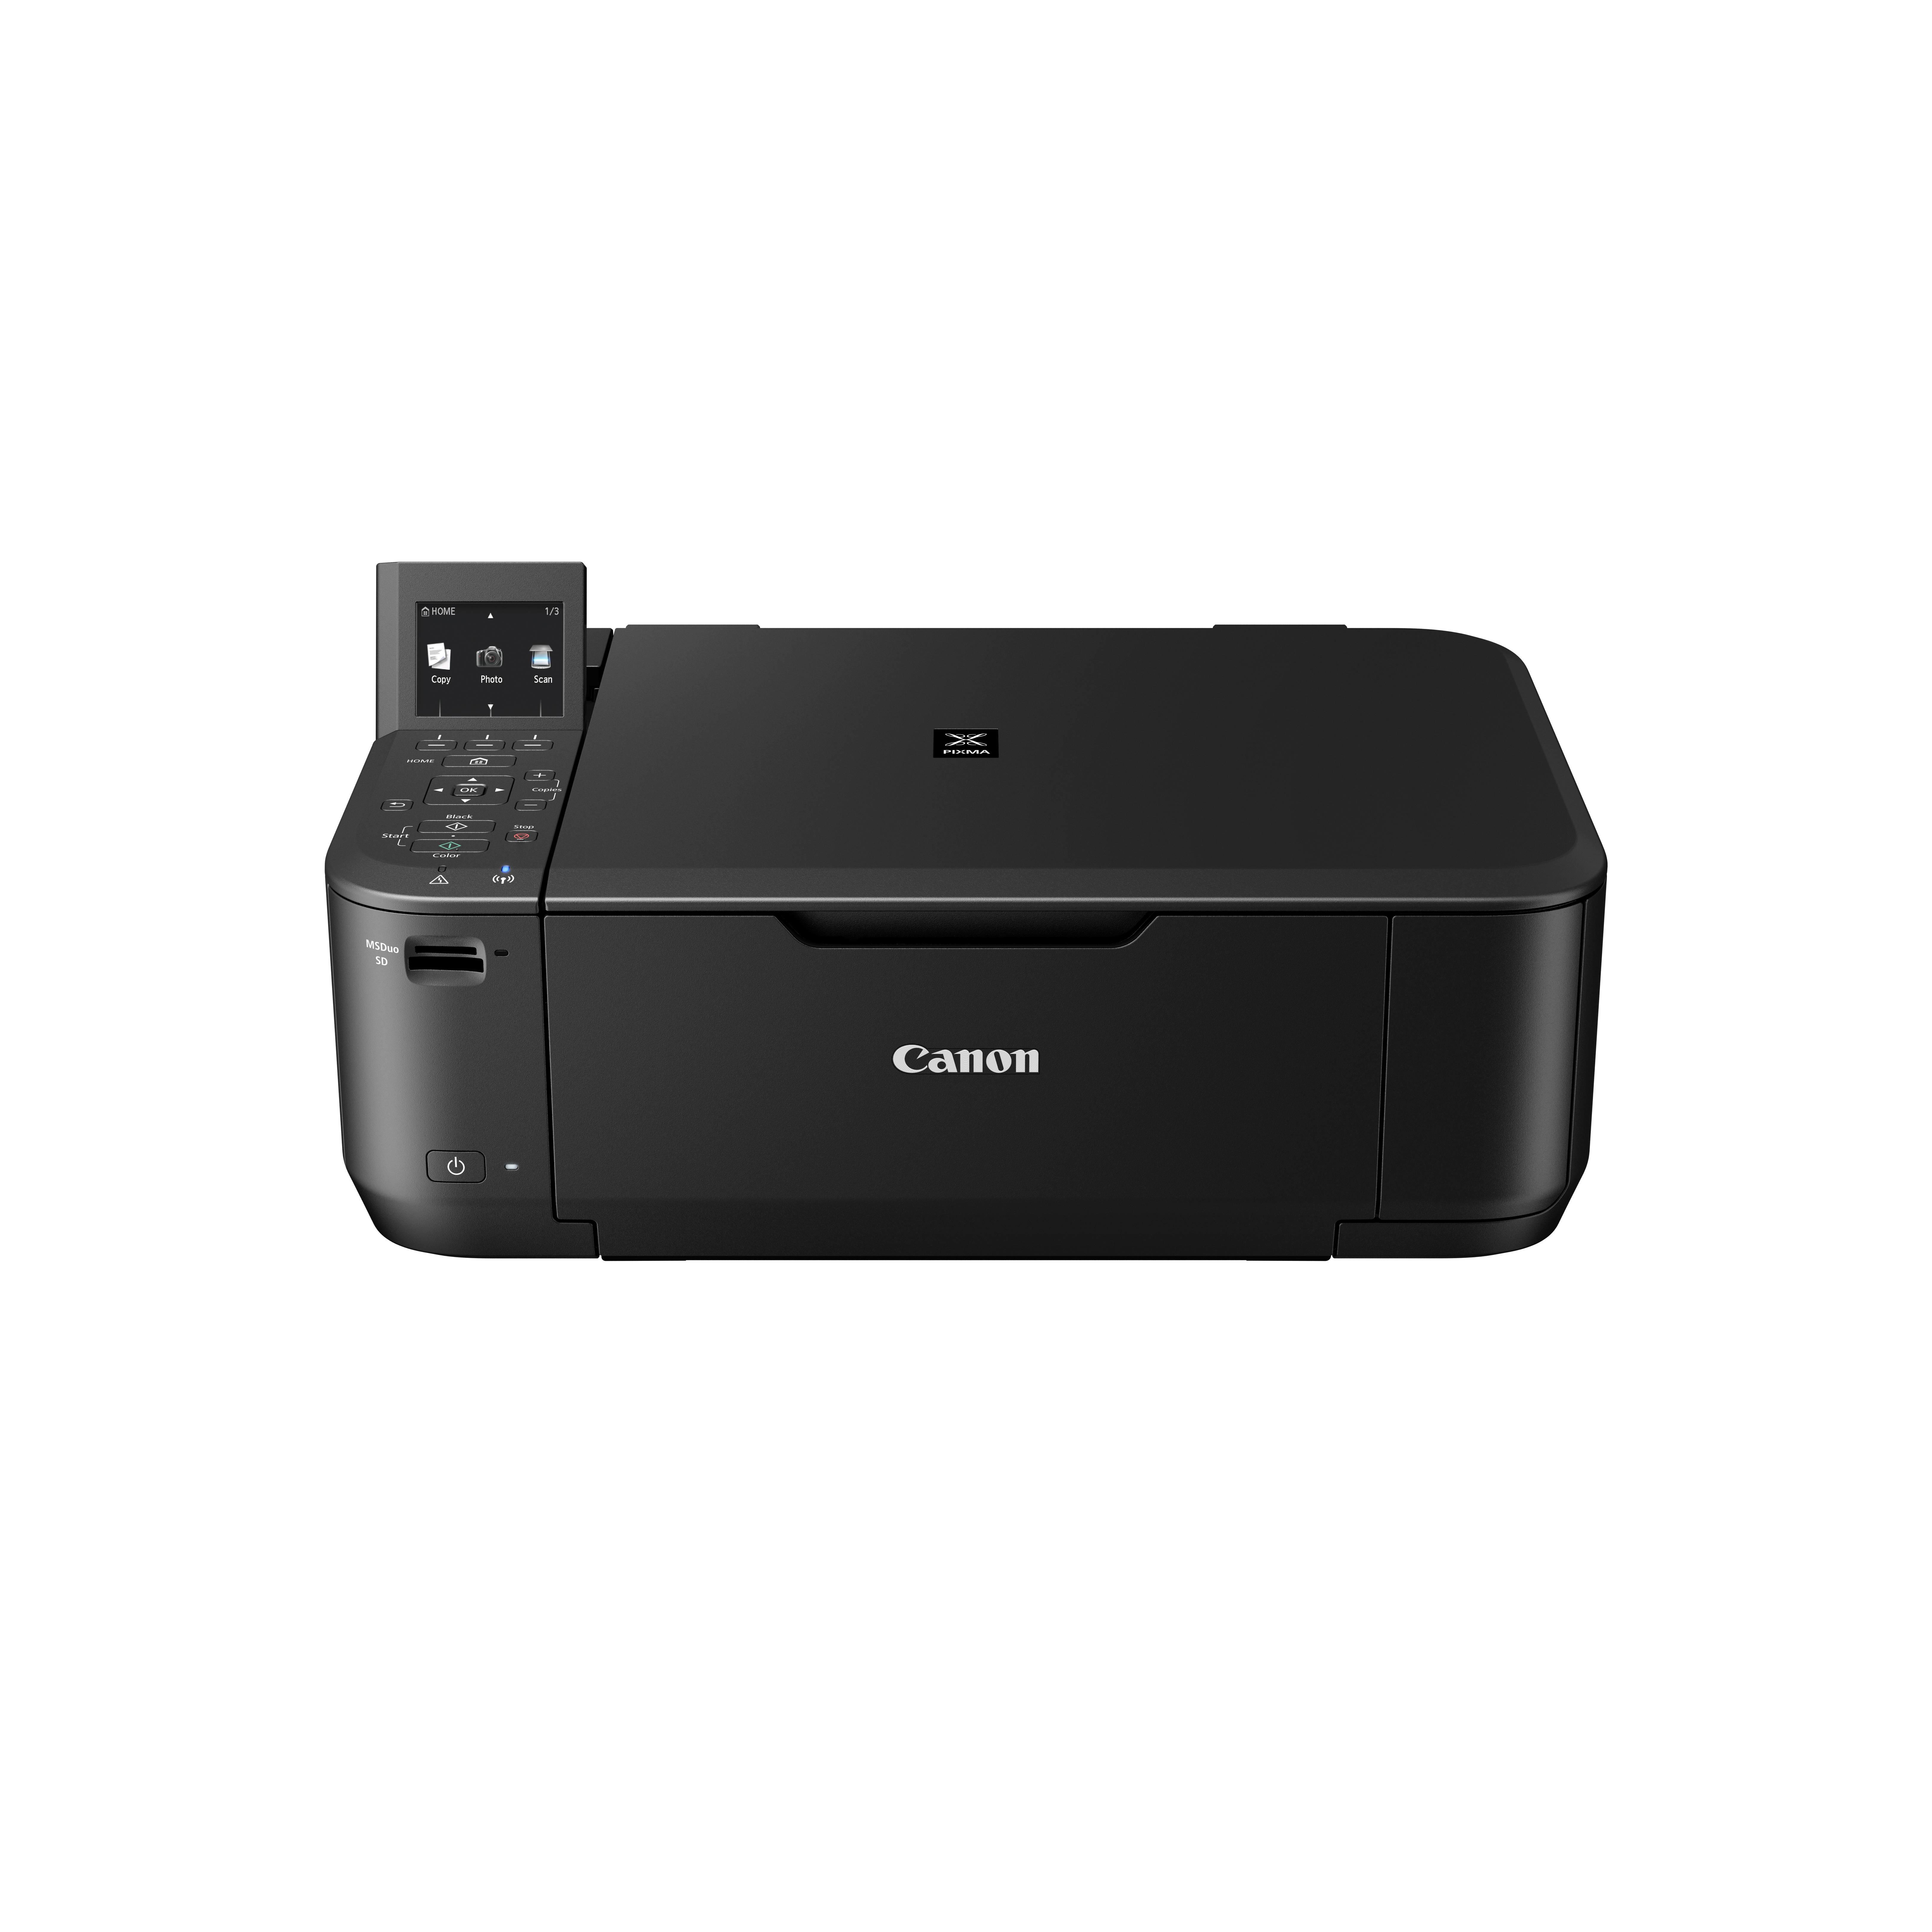 plexcom hardware for you canon pixma mg4250 multifunktionsdrucker. Black Bedroom Furniture Sets. Home Design Ideas